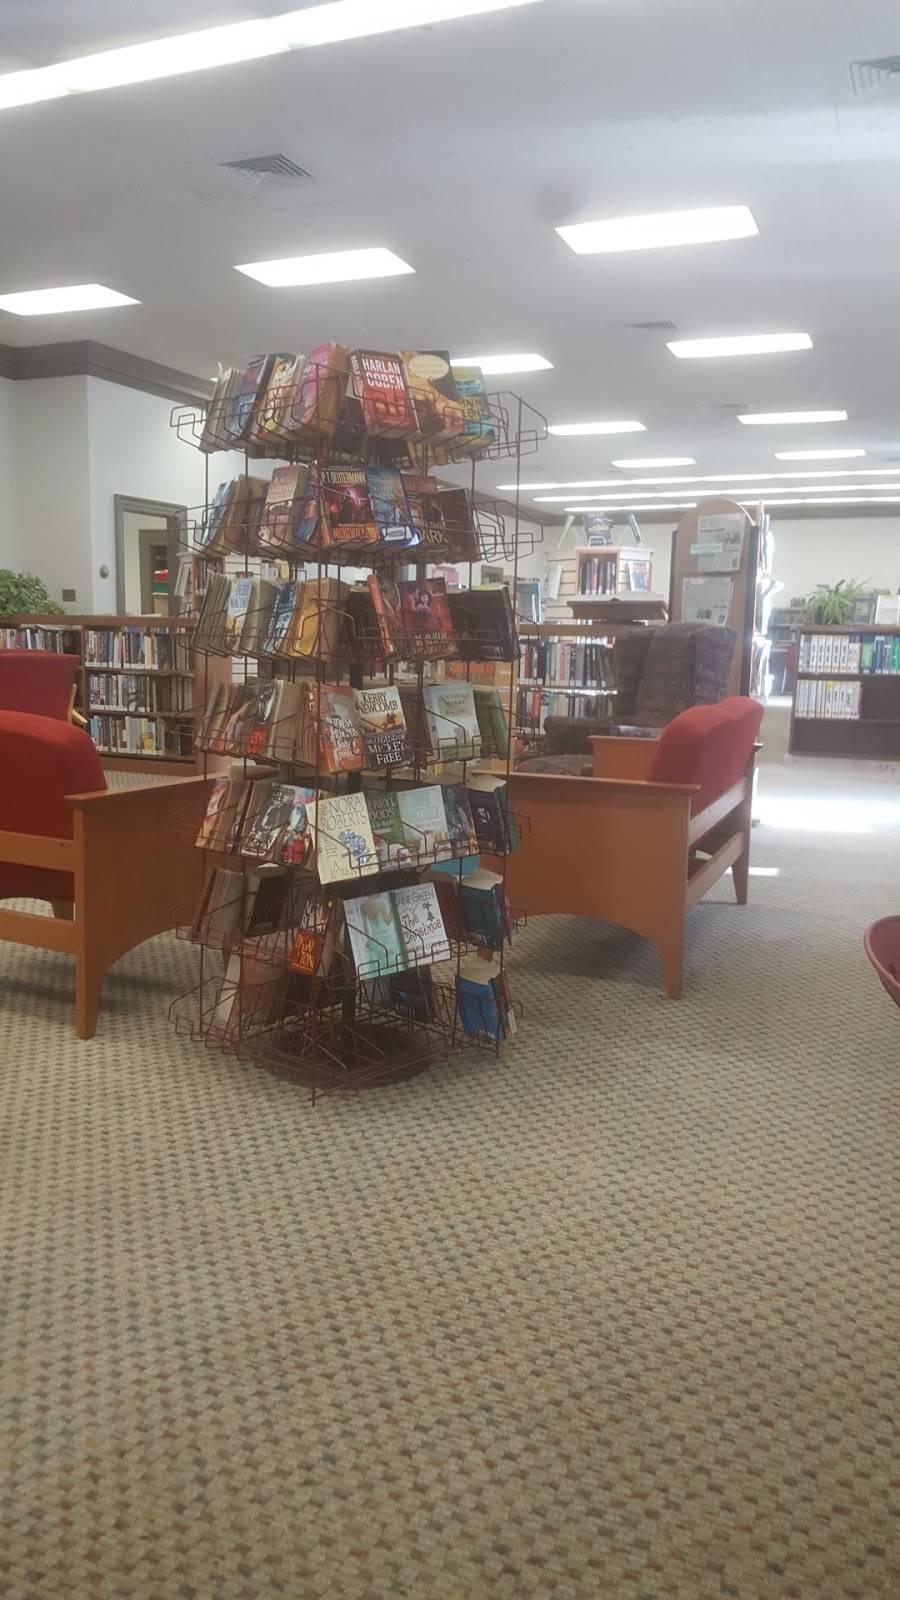 Norfolk Public Library: Larchmont Branch - library  | Photo 3 of 4 | Address: 6525 Hampton Blvd, Norfolk, VA 23508, USA | Phone: (757) 441-5335